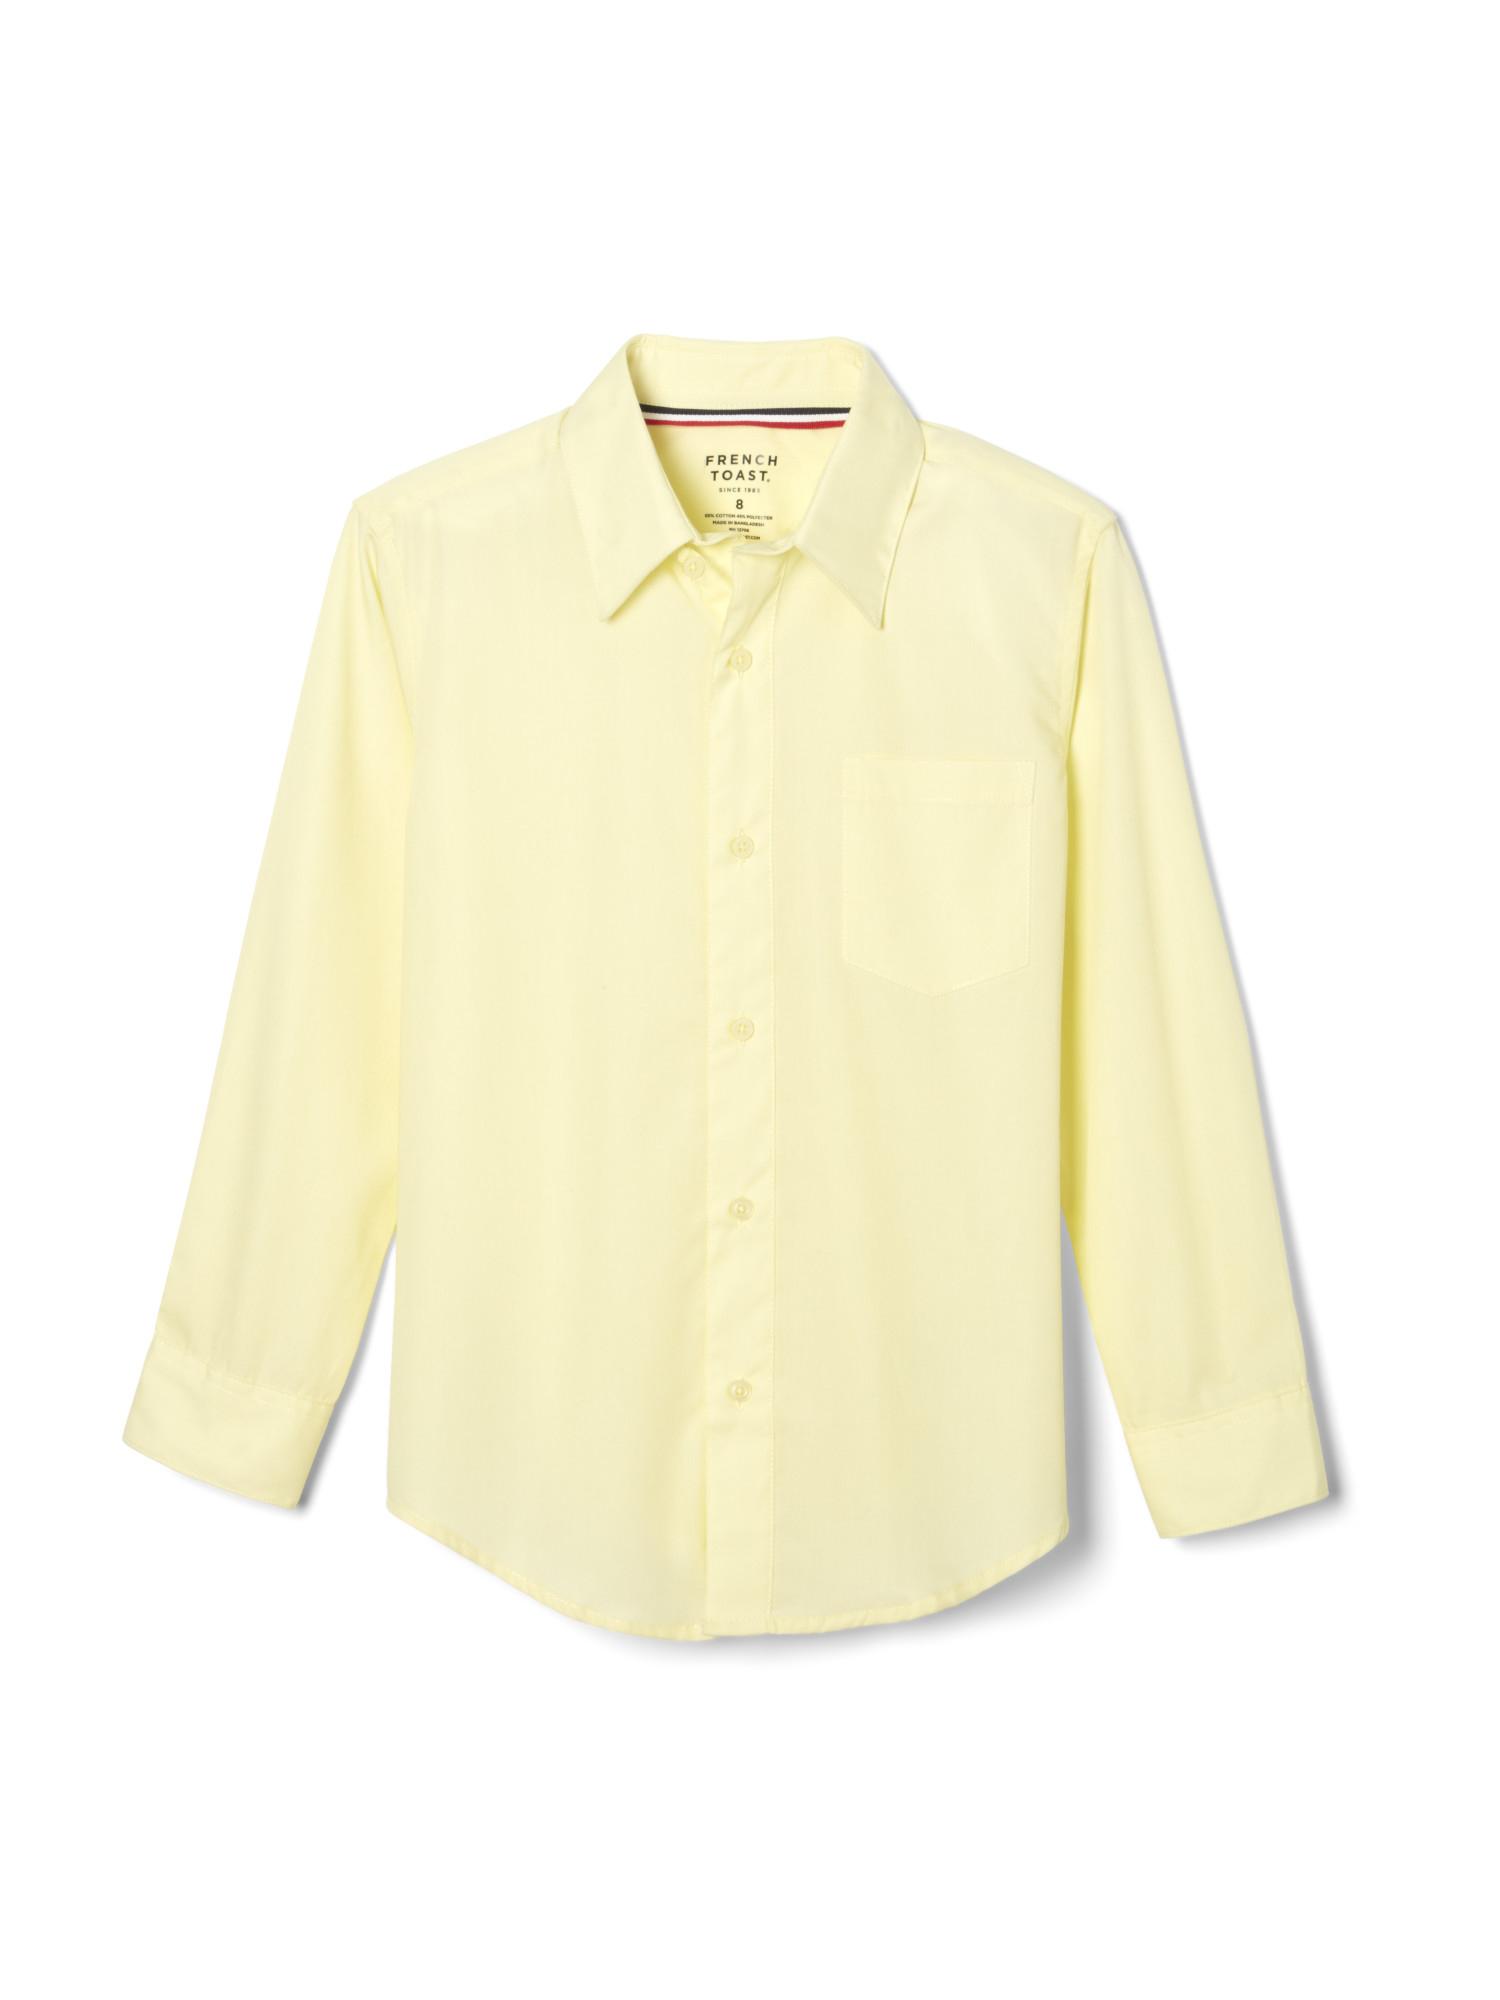 French Toast School Uniform Boys Long Sleeve Classic Dress Shirt Yellow Husky